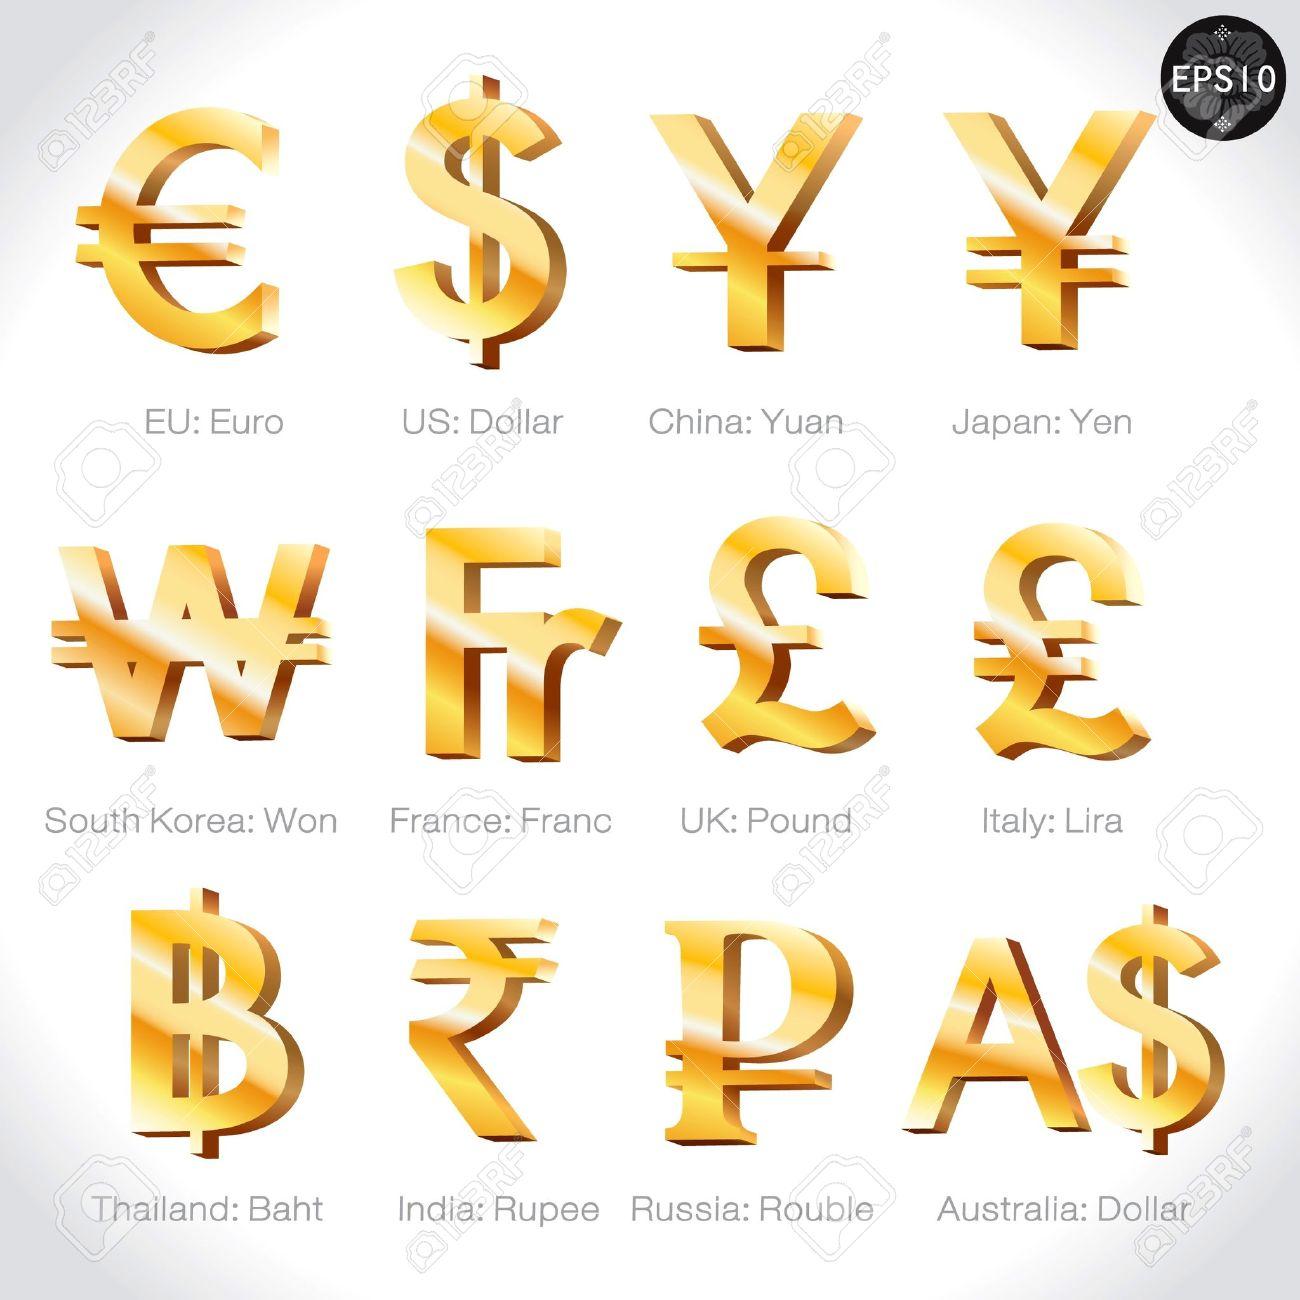 Currency Signs Dollar Euro Yen Yuan Wonfrancpoundlir